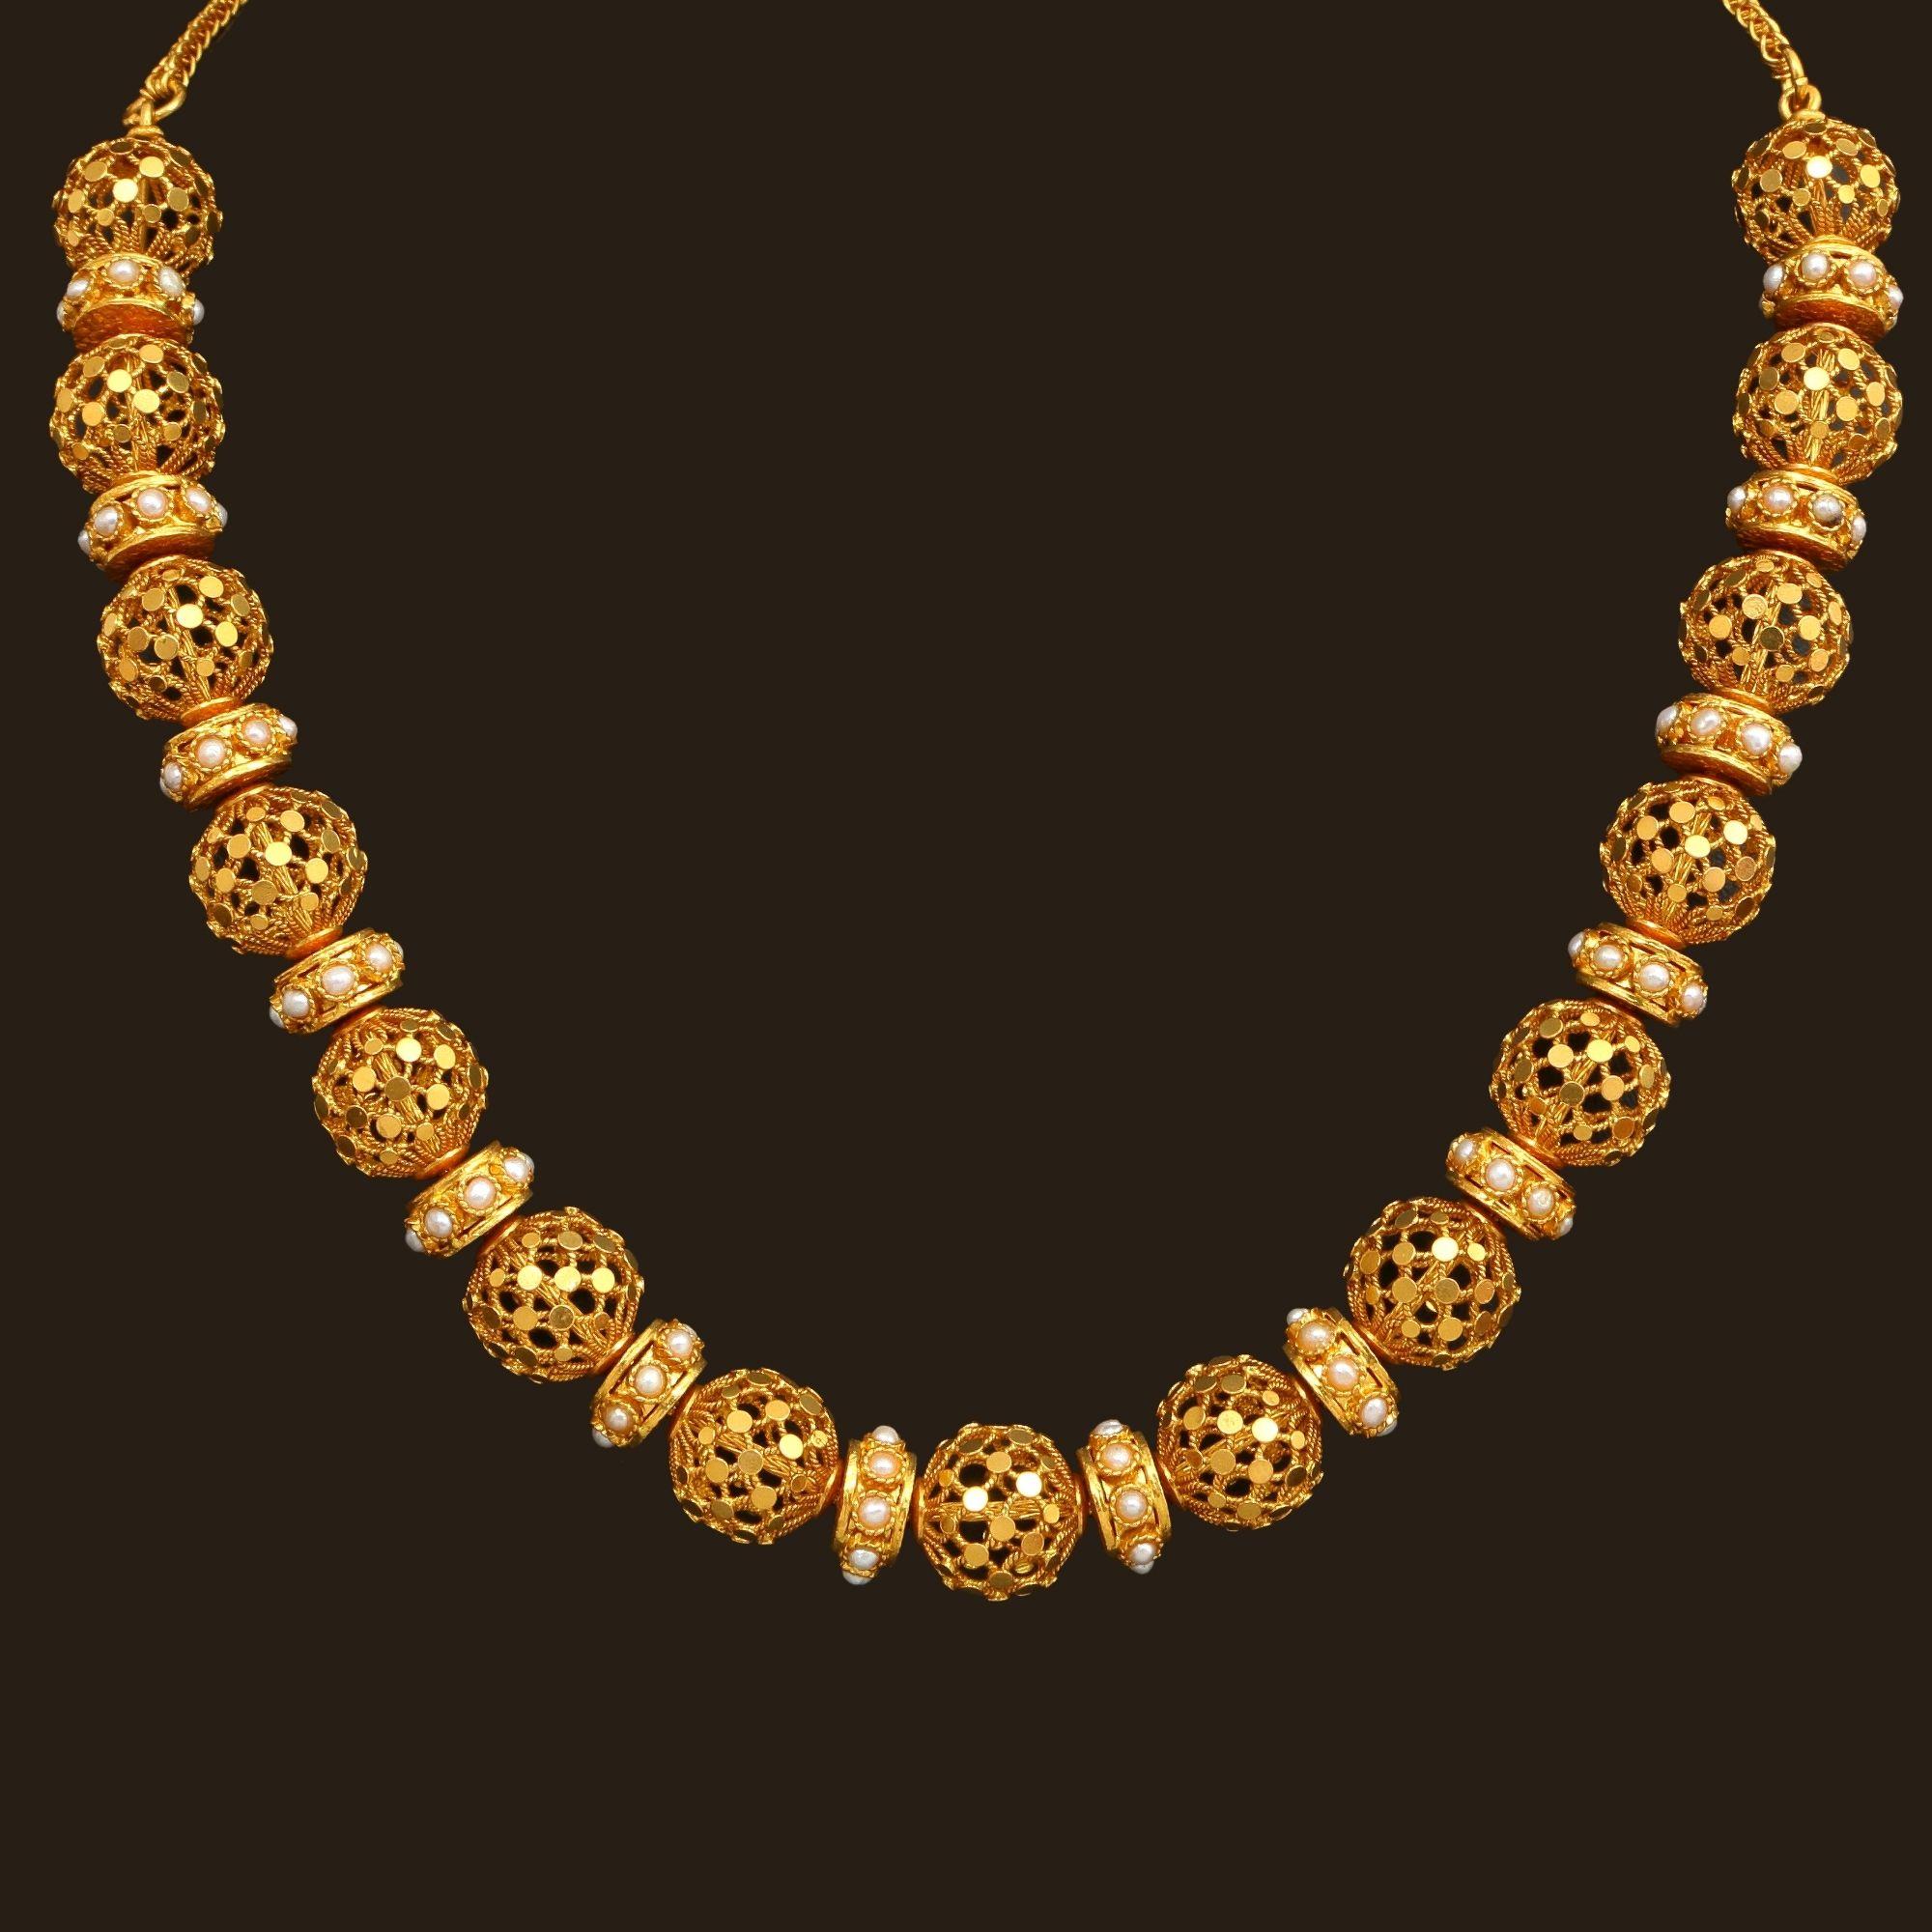 http://www.vummidi.com/store/product/774/gold-antique ...